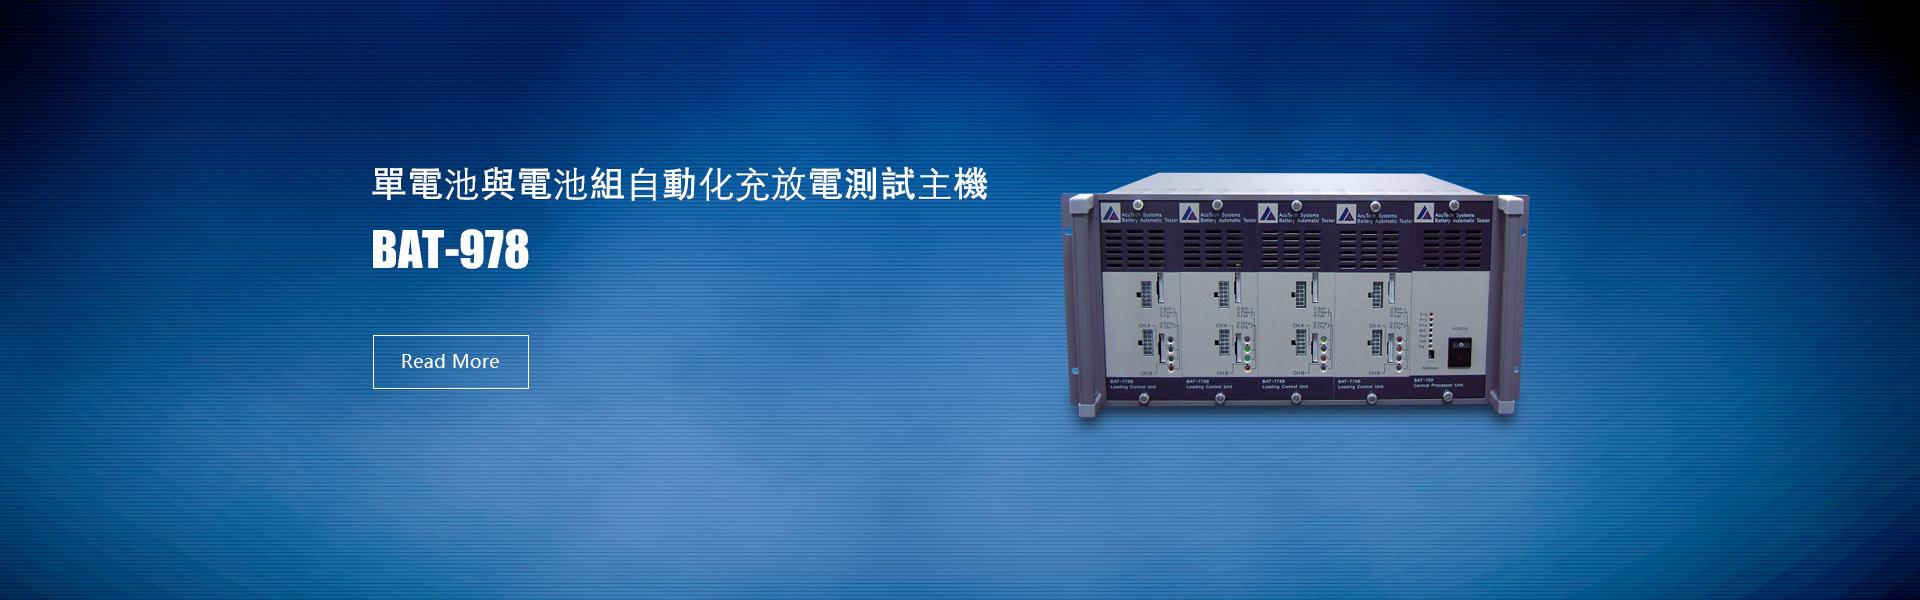 BAT-978單電池與電池組自動化充放電測試主機